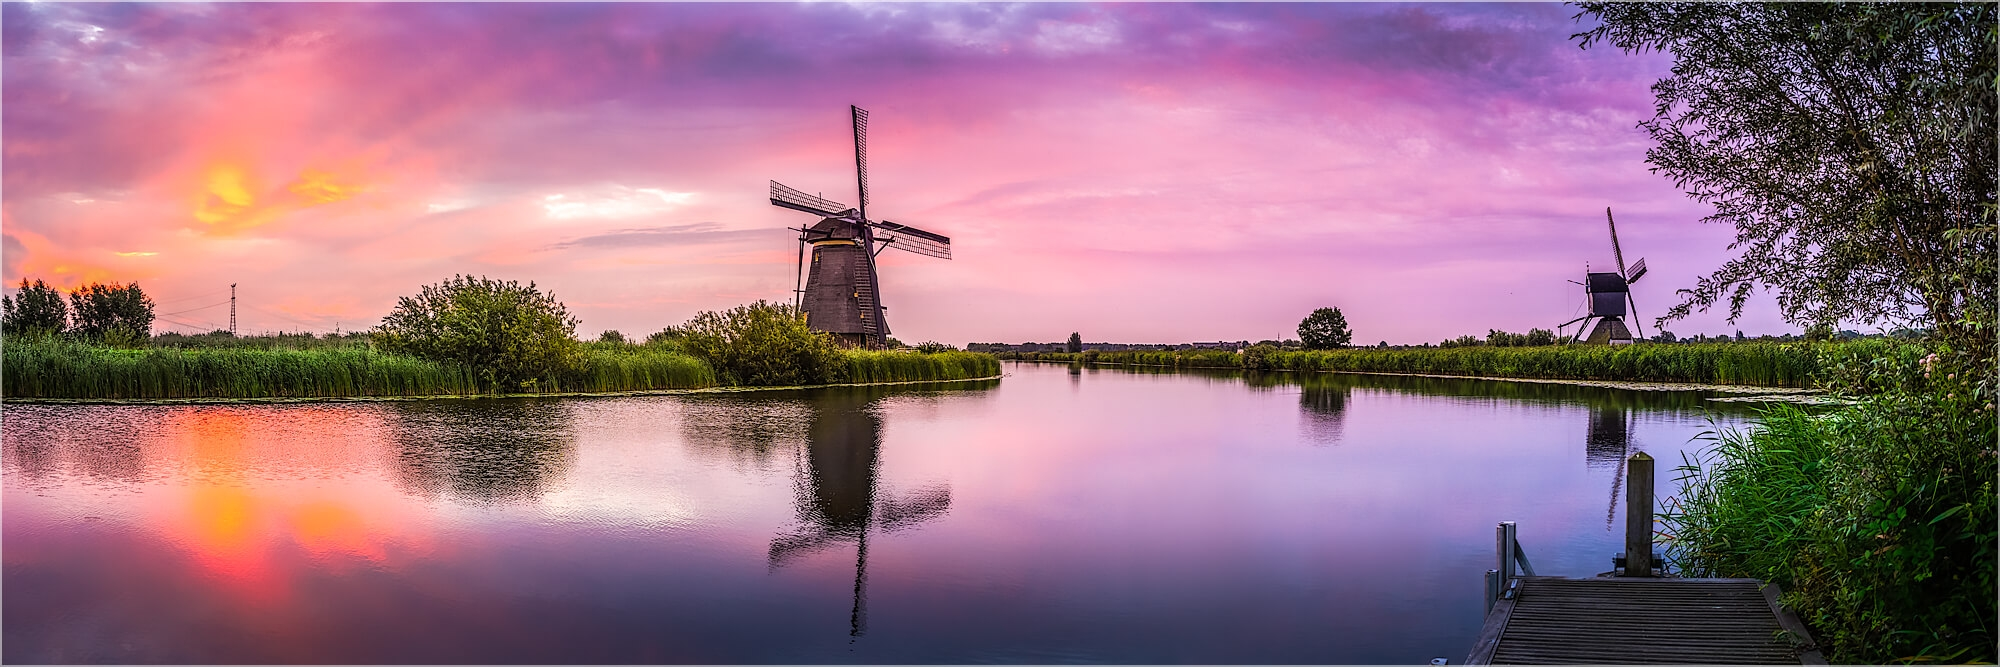 Panoramabild morgens in Kinderdijk Holland